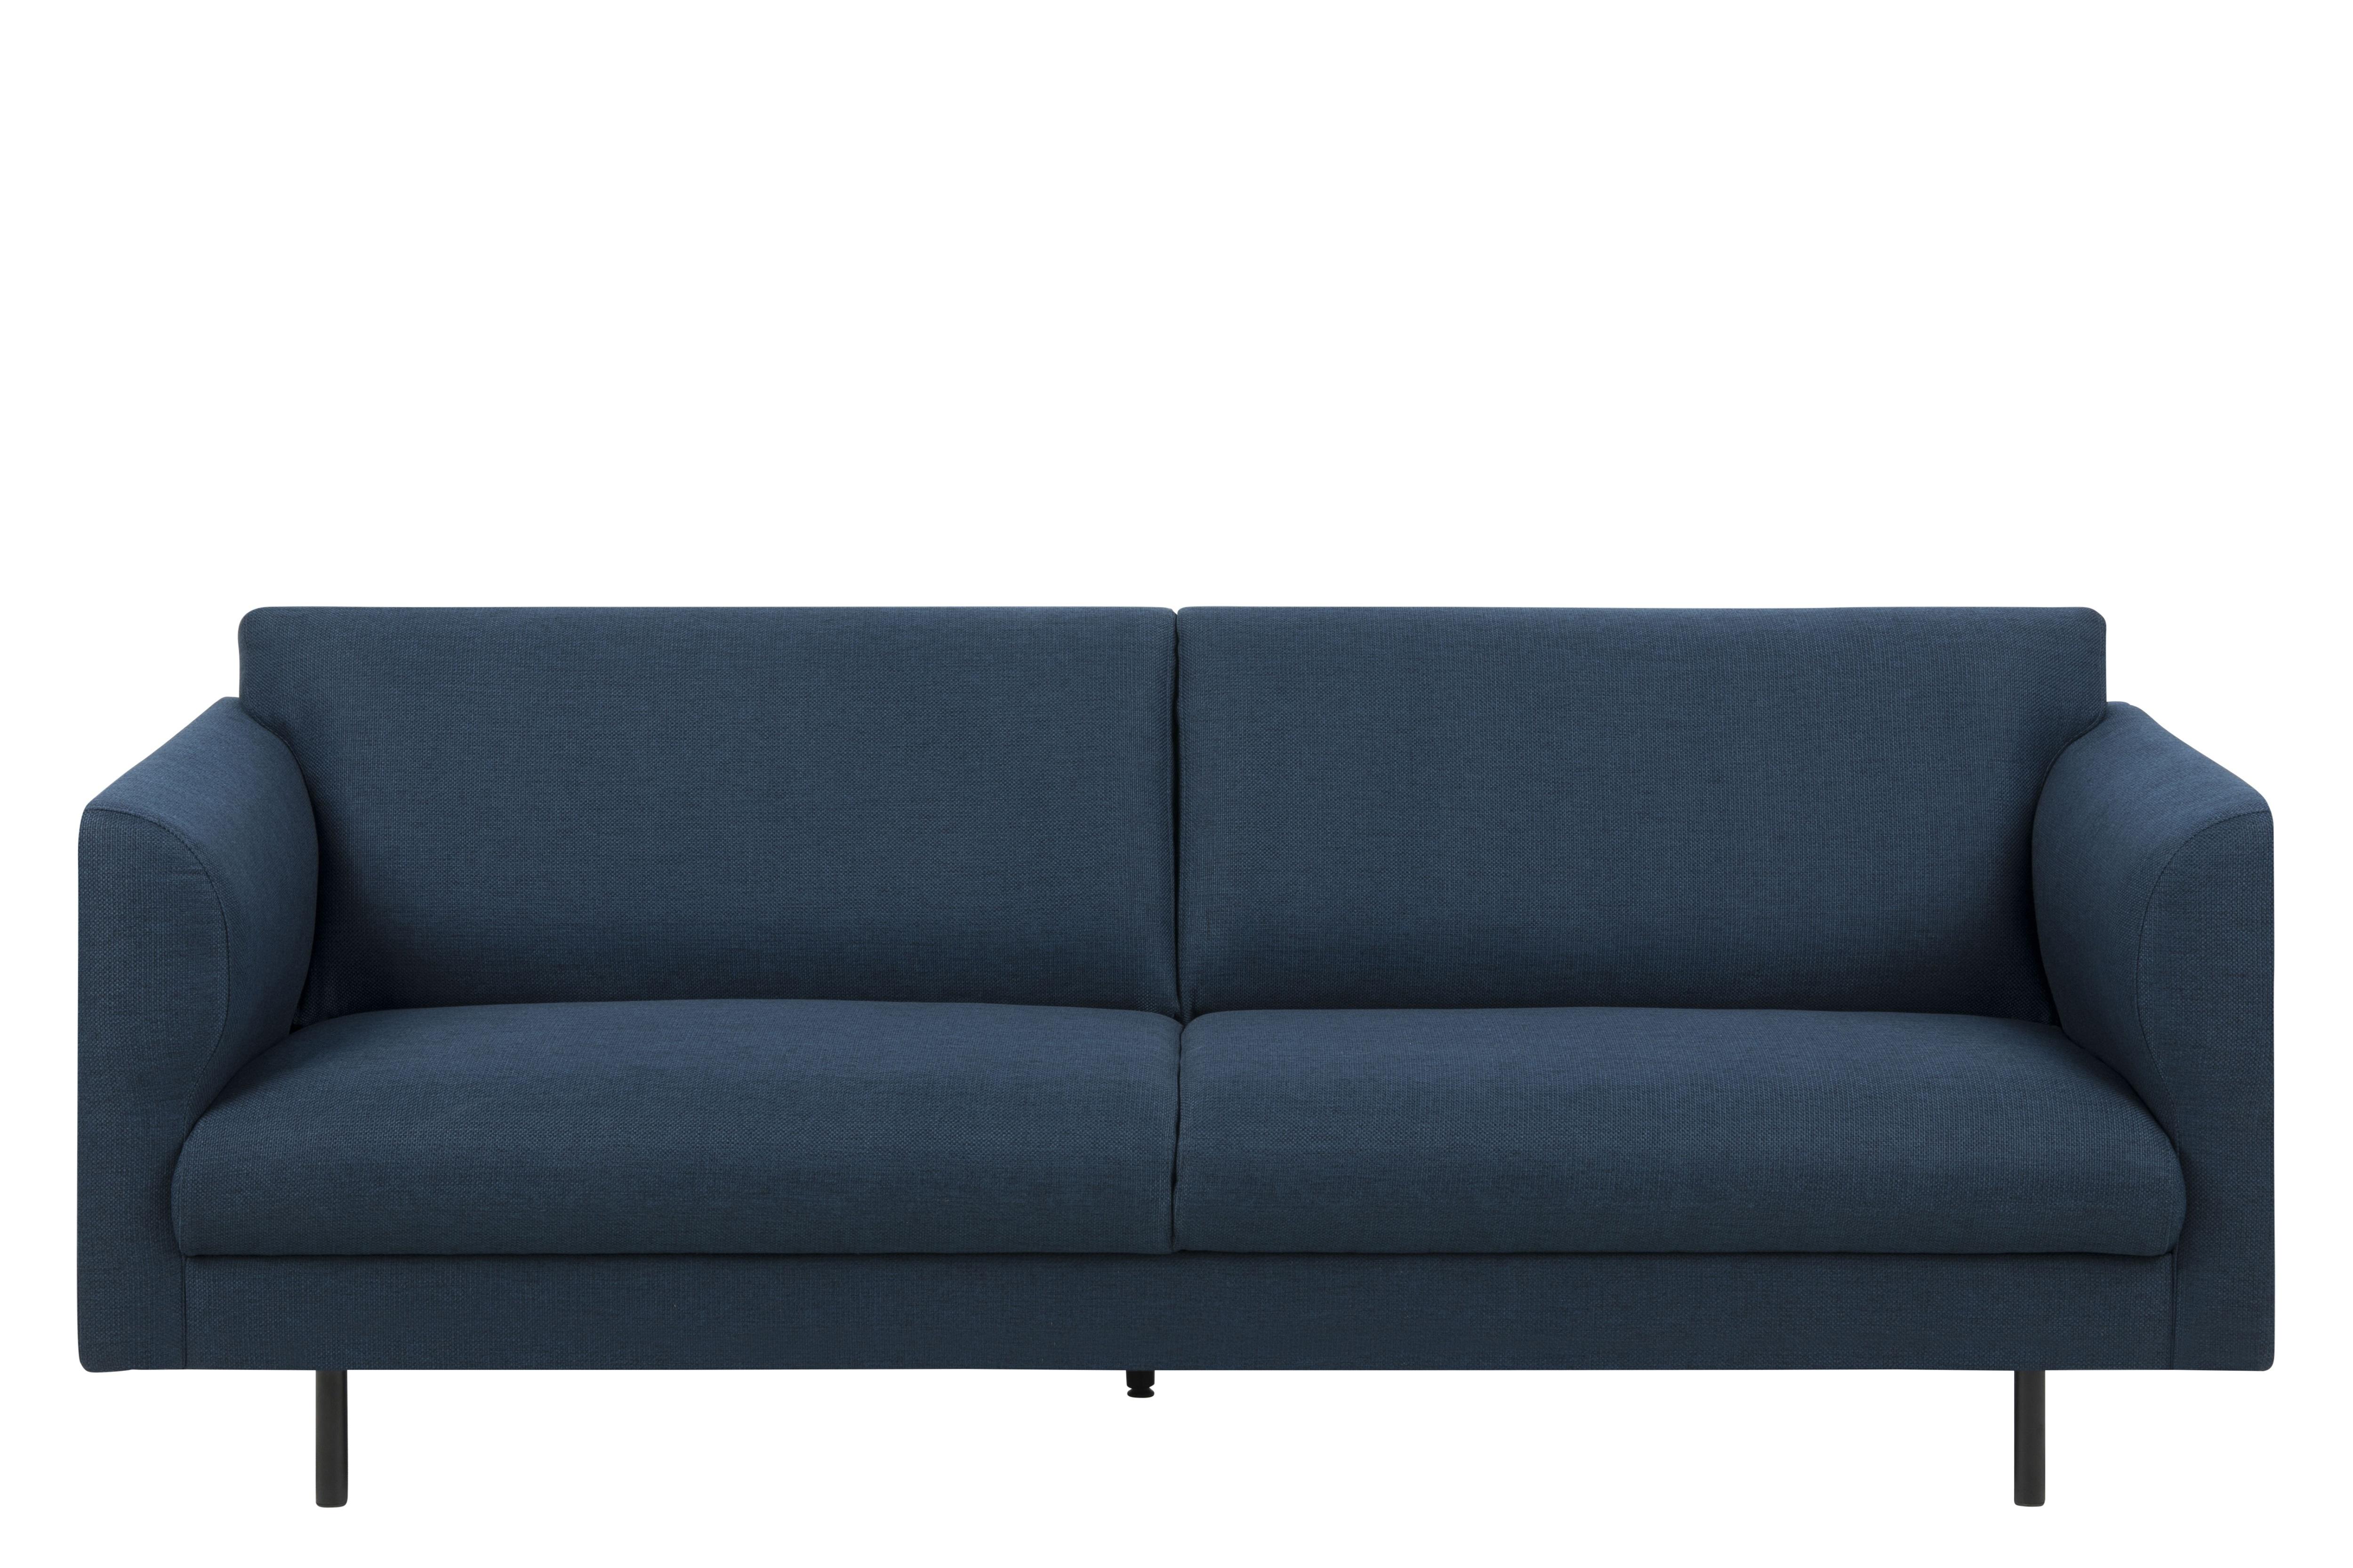 Canapea 3 locuri Conley Dark Blue